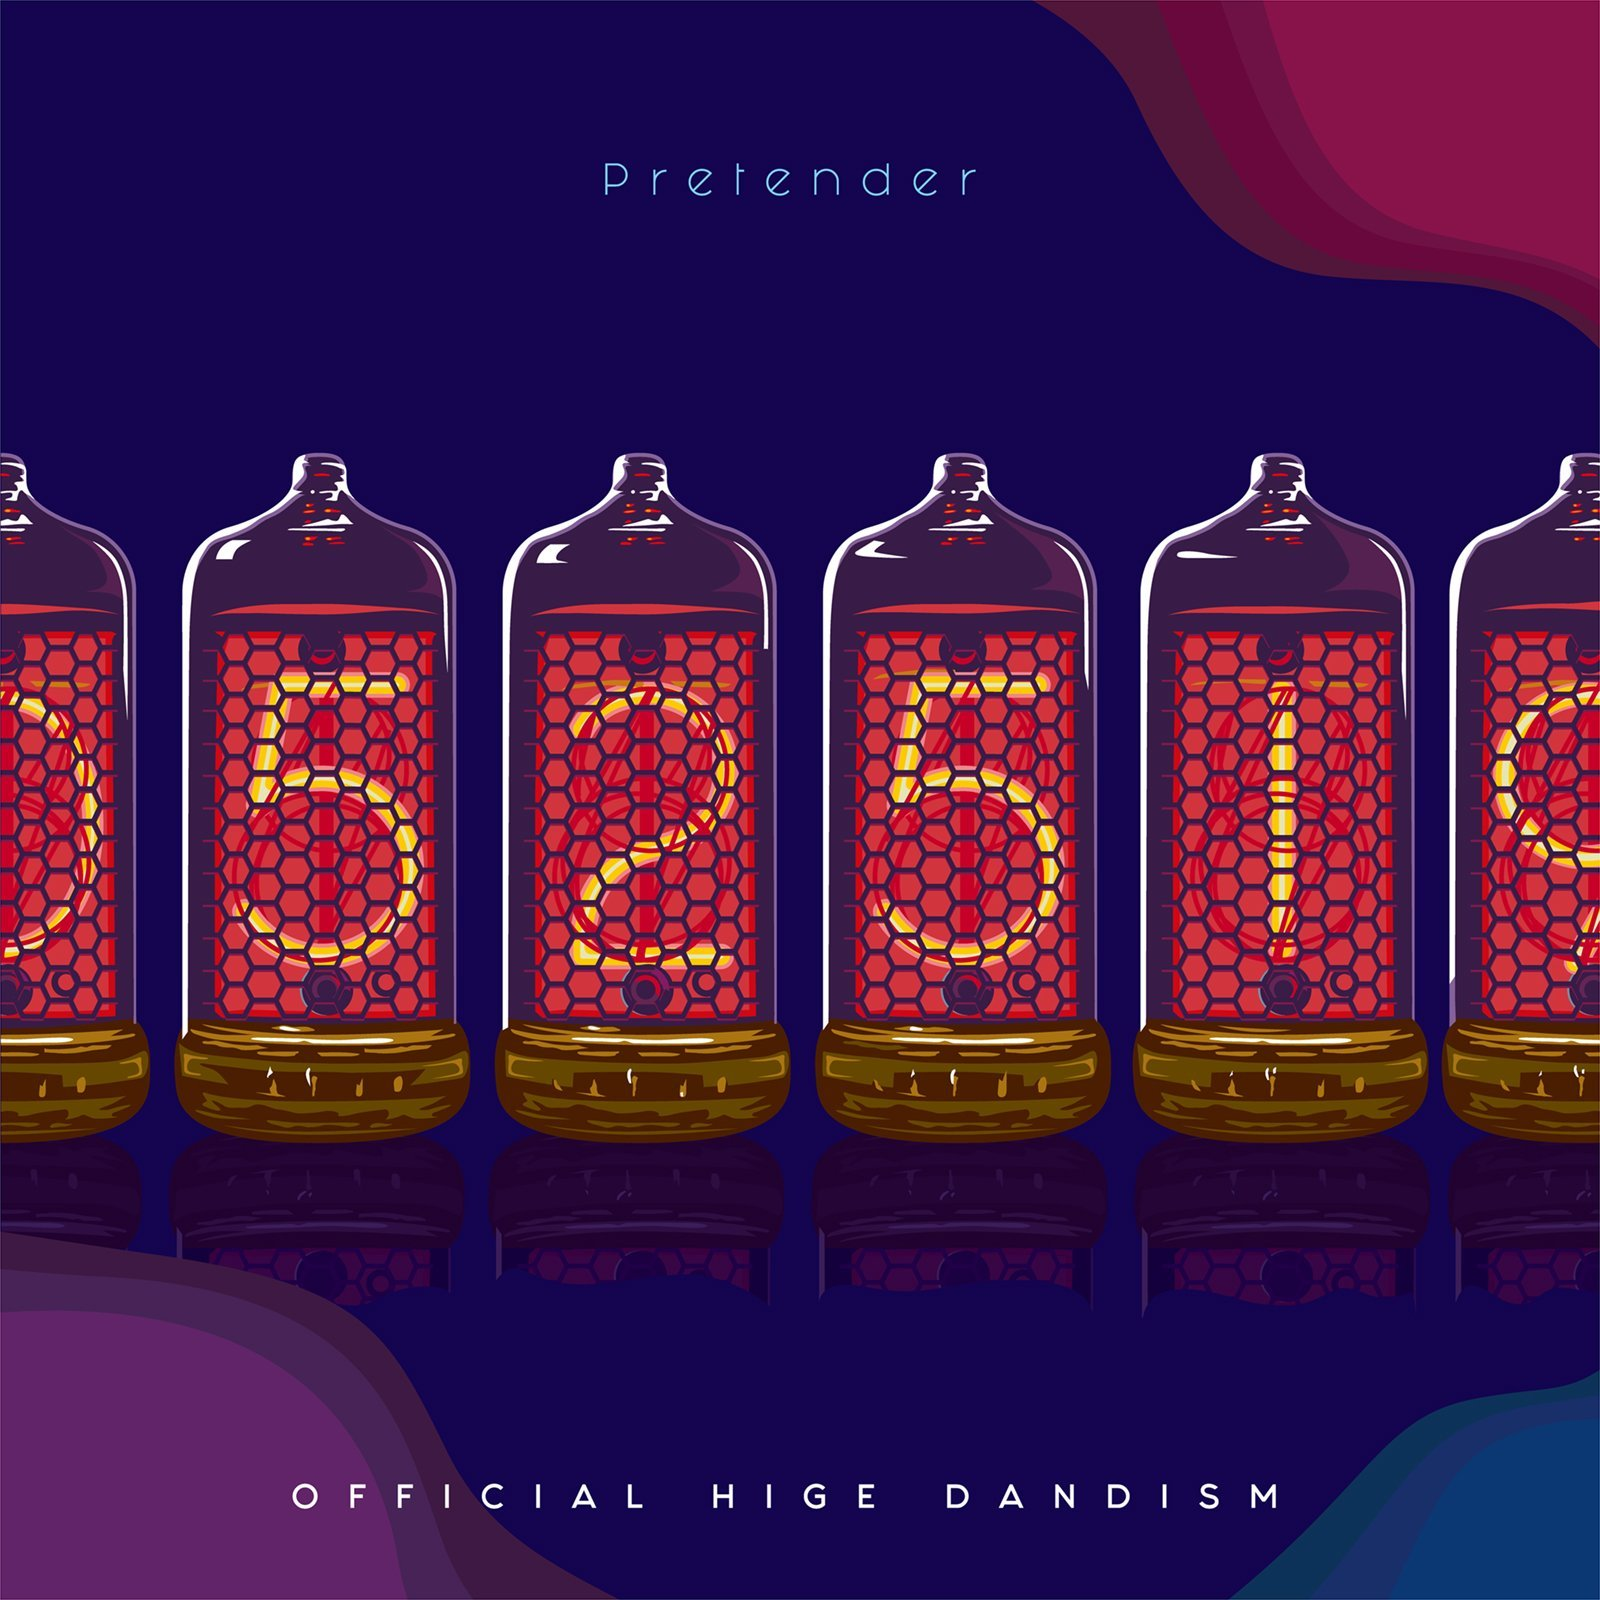 Official髭男dism (オフィシャルヒゲダンディズム) 2ndシングル『Pretender』(生産限定盤) 高画質CDジャケット画像 (ジャケ写)